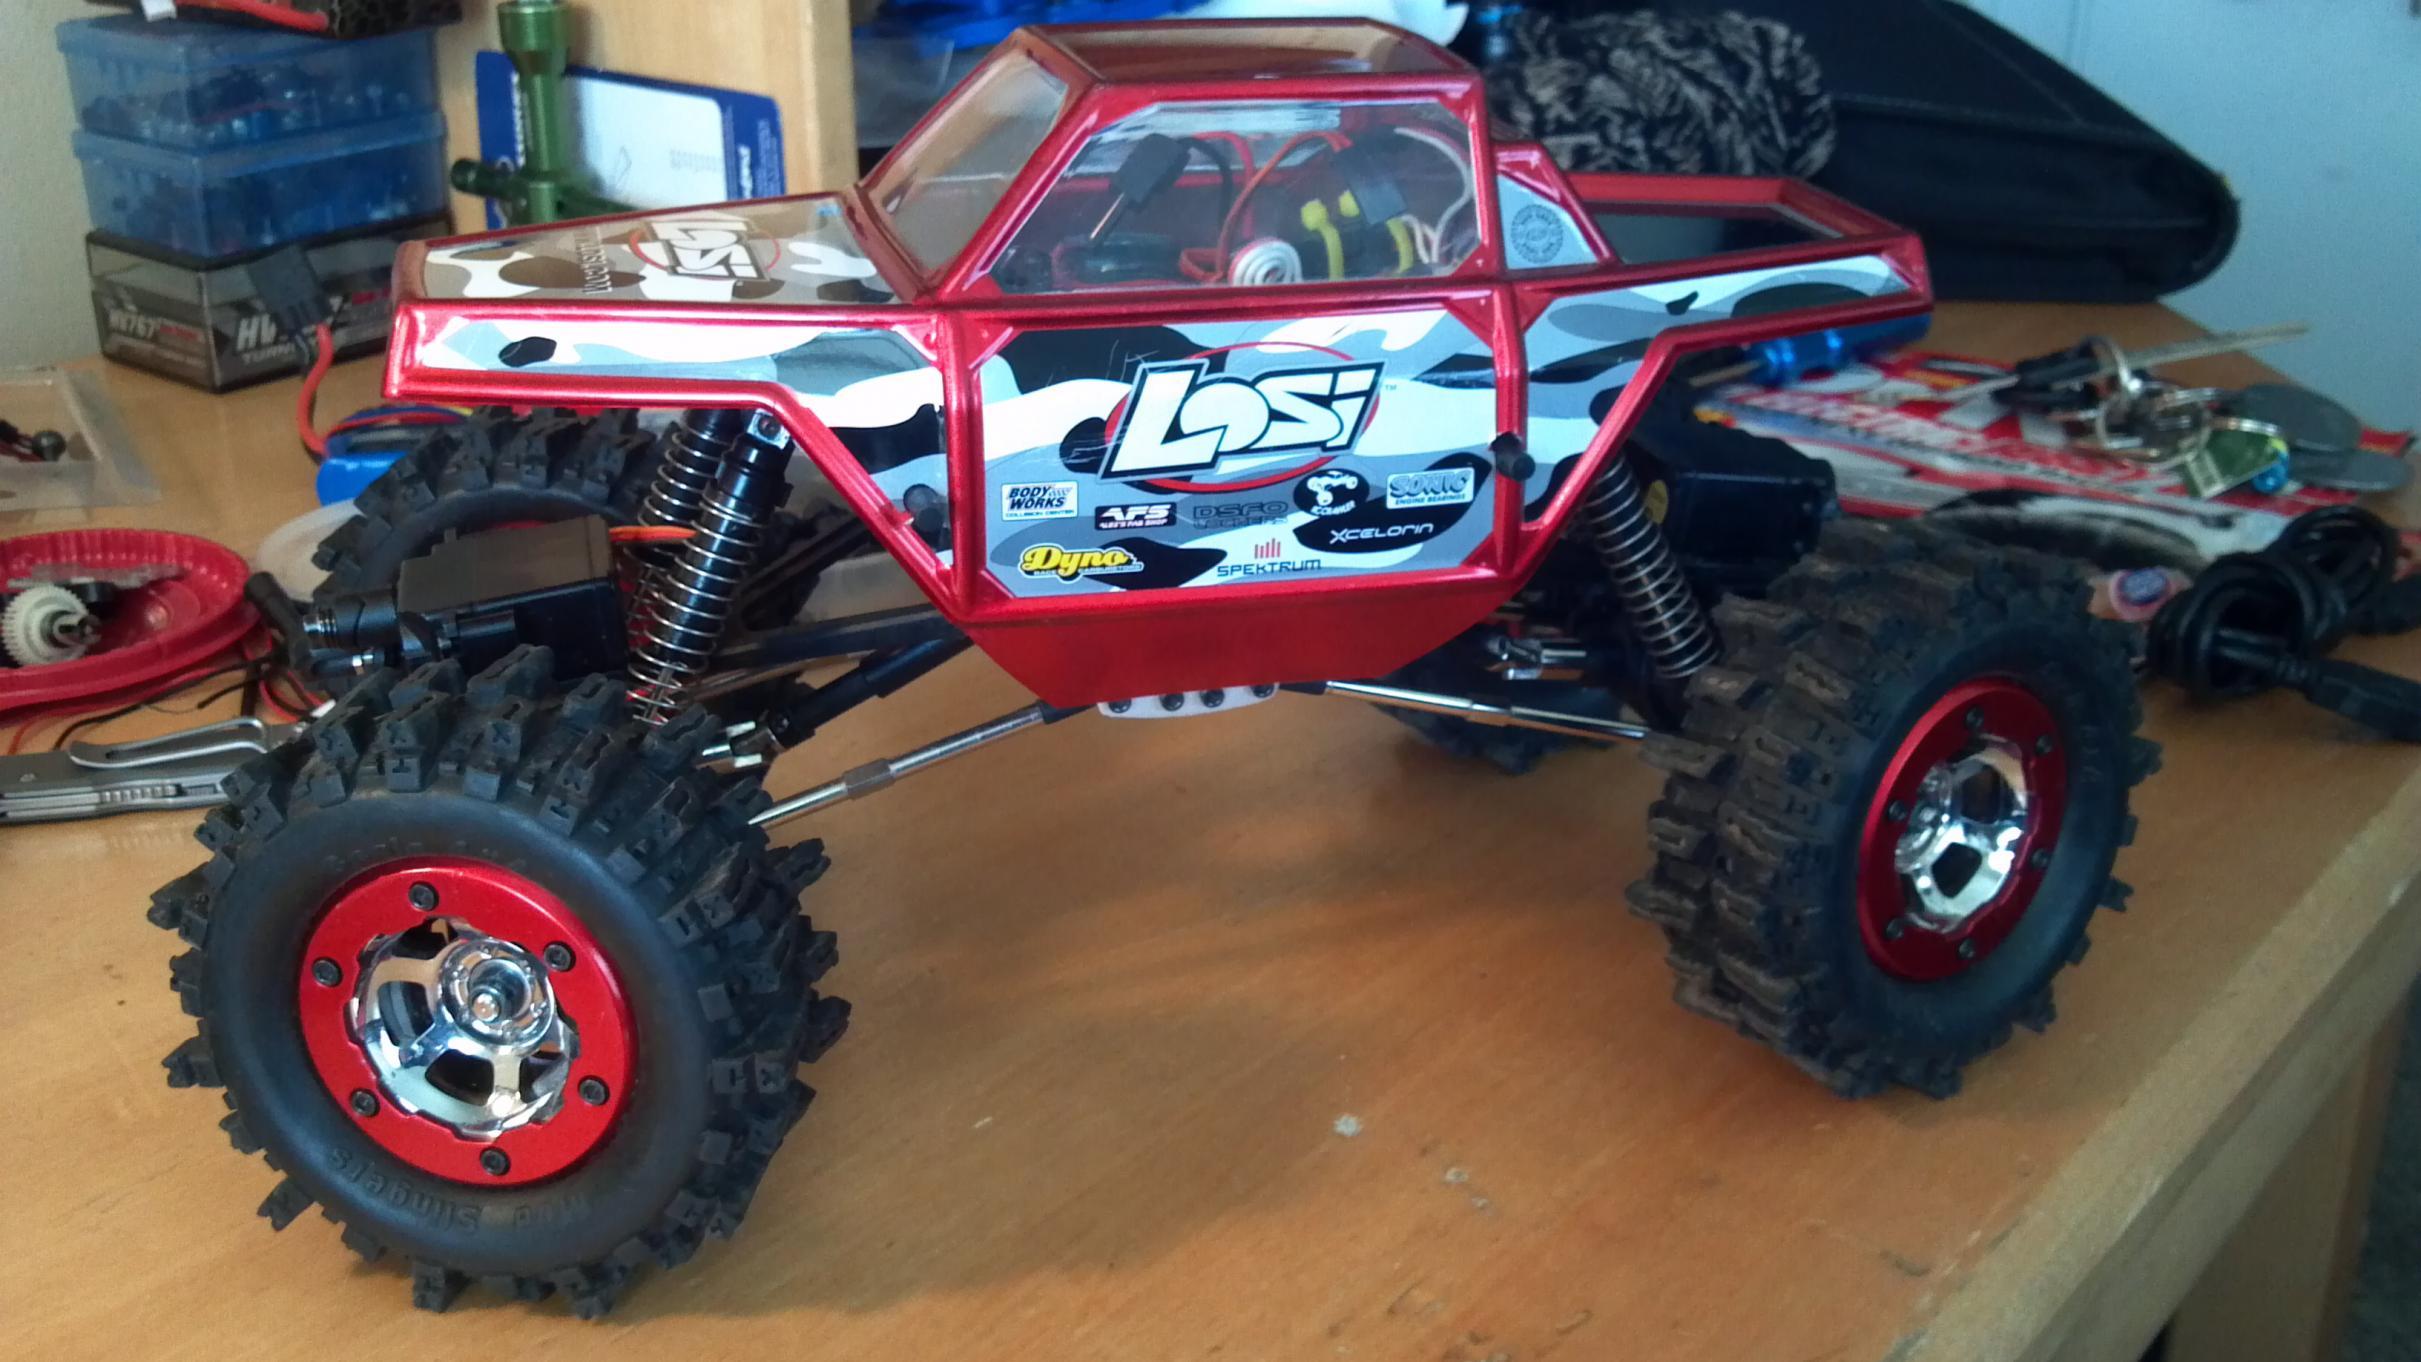 2012 06 artr losi mini crawler with 4 wheel steering for sale